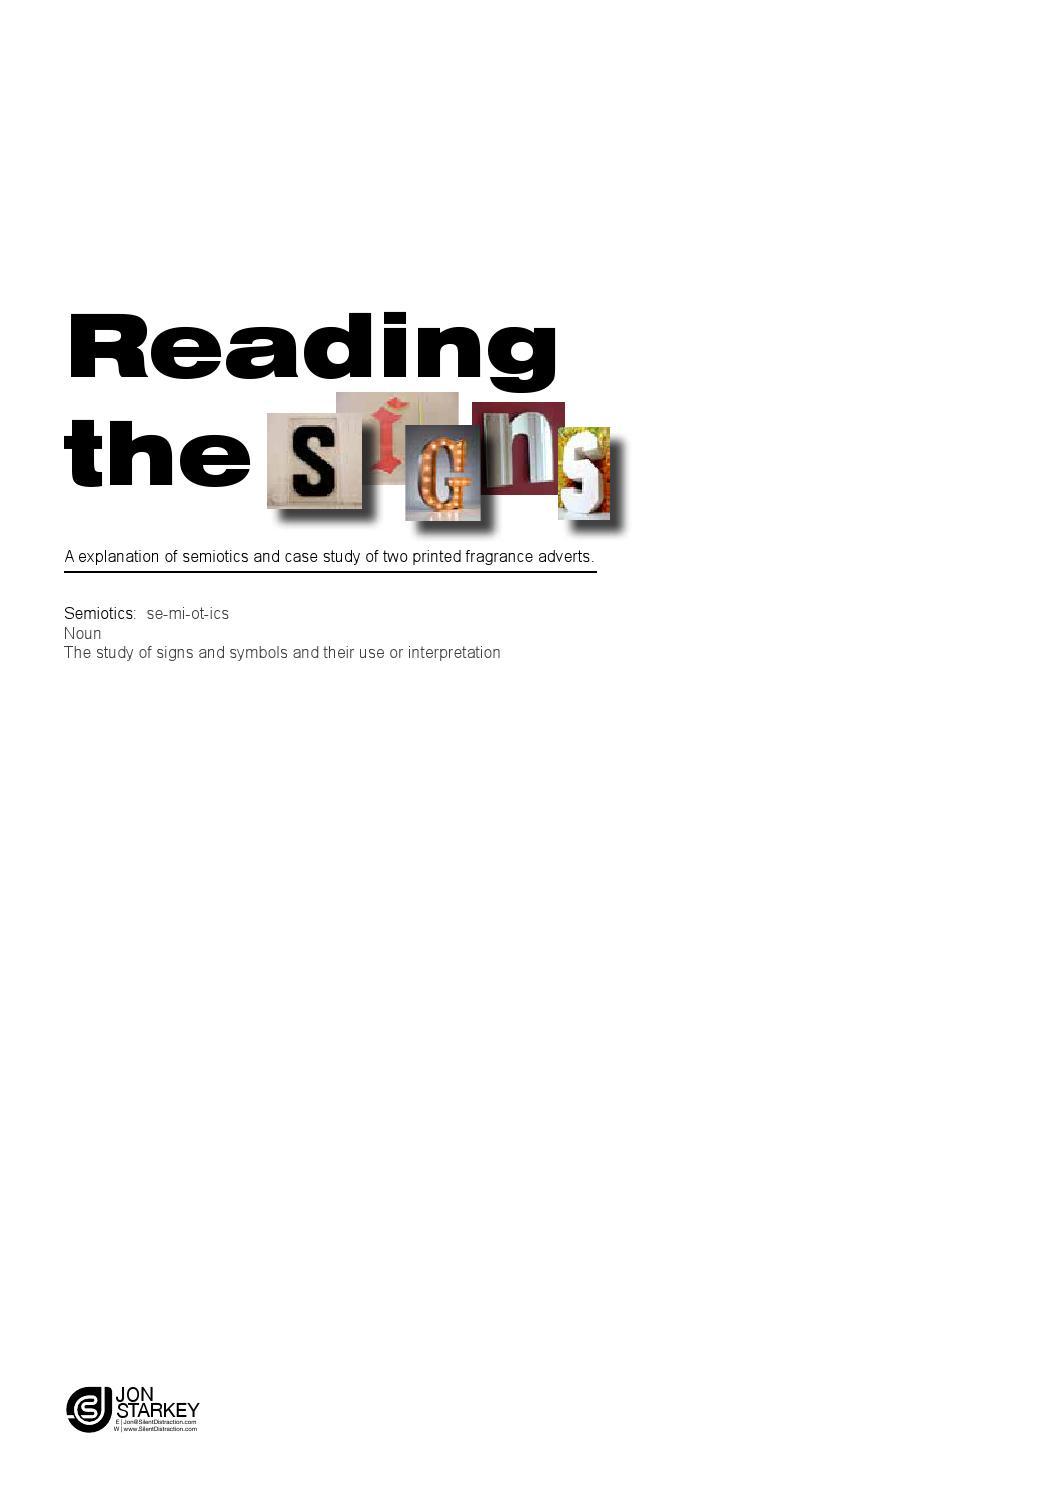 Reading the signs semiotics by silentdistractiondesign issuu buycottarizona Choice Image